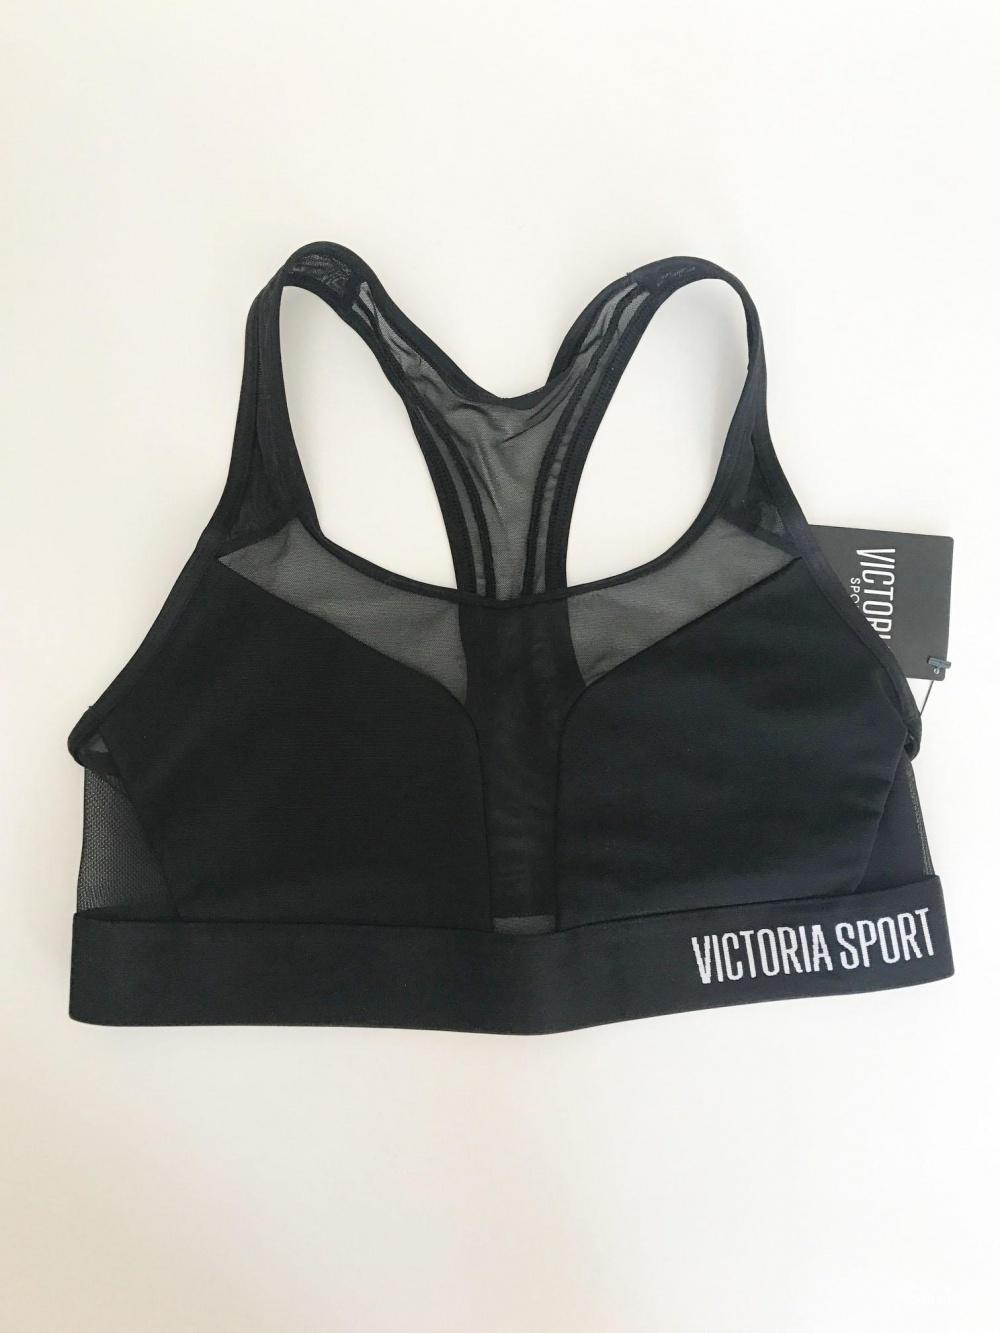 Victorias secret спорт бра размер L